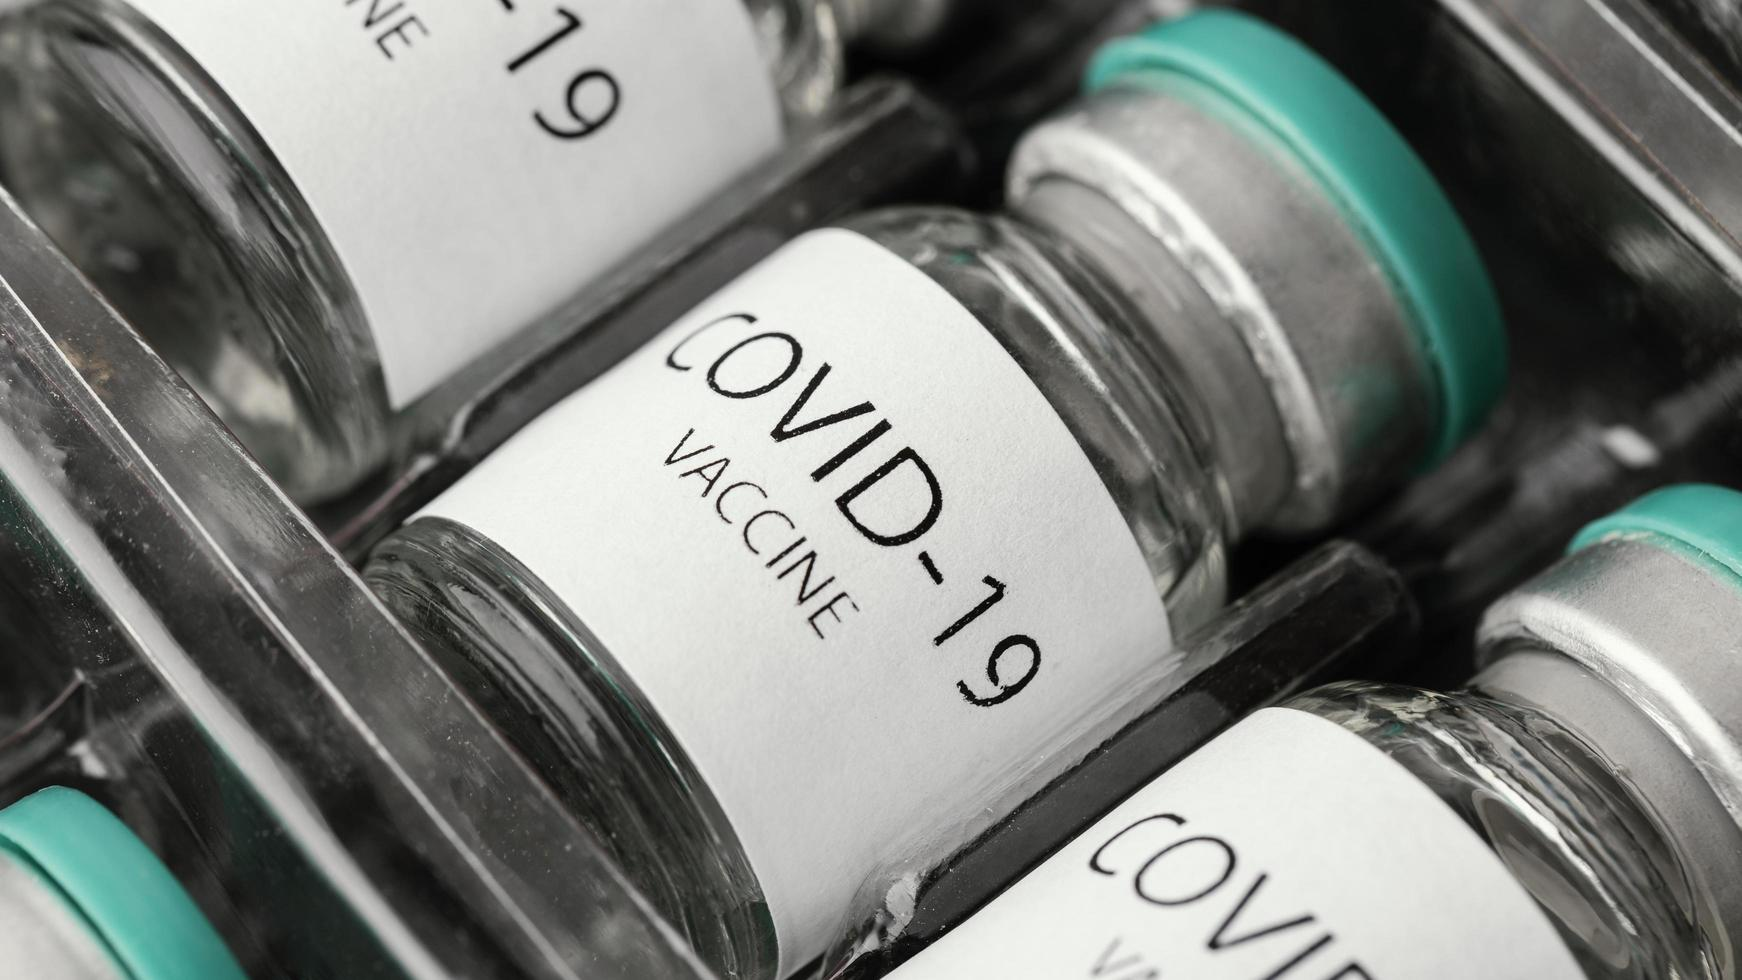 Covid-19-vaccin in fles foto